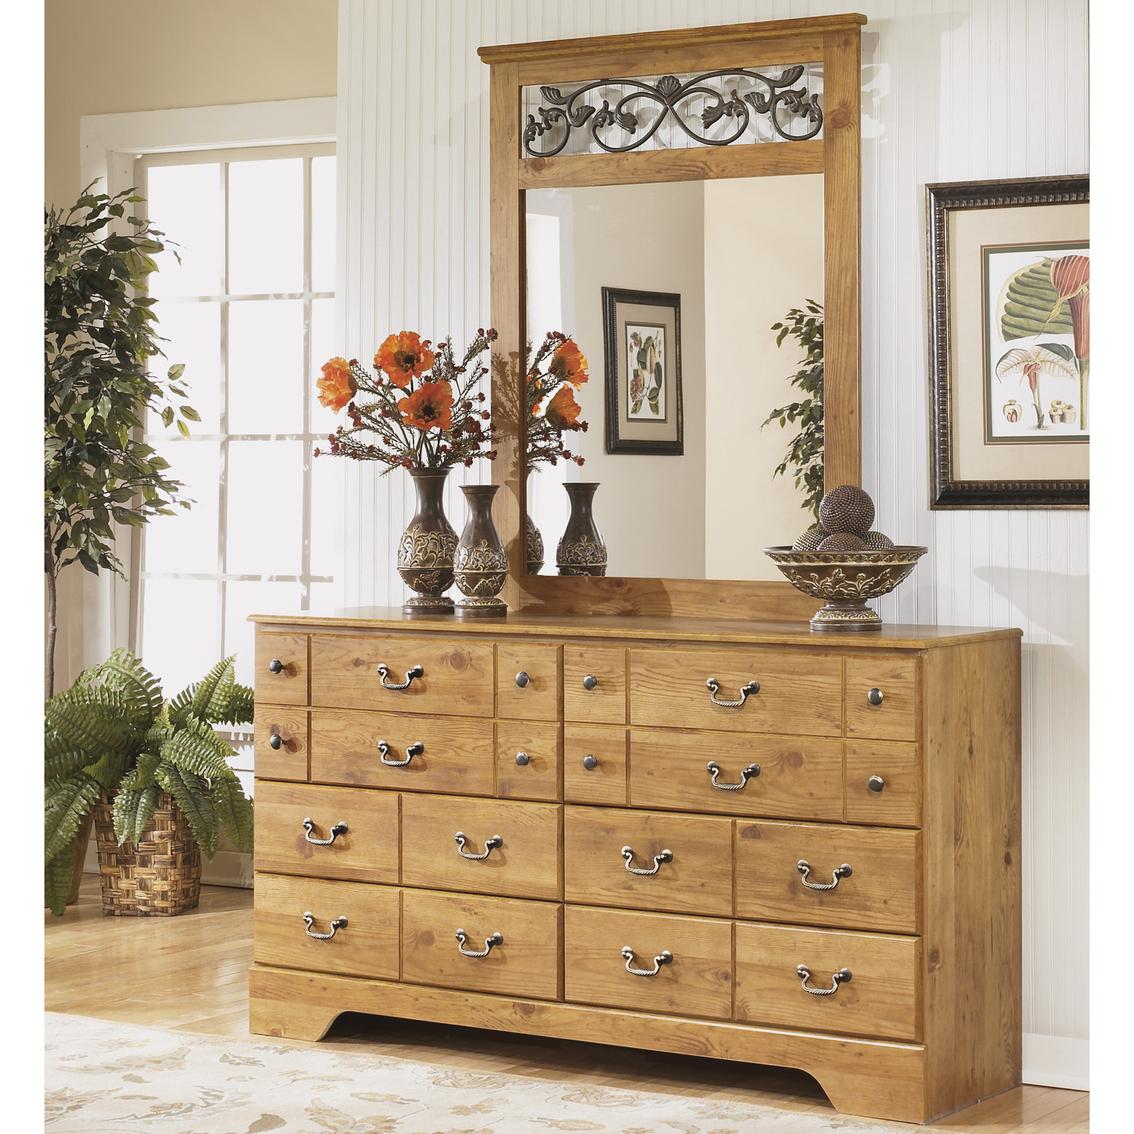 Ashley Signature Design Bittersweet 6 Drawer Dresser And Mirror Dressers Home Appliances